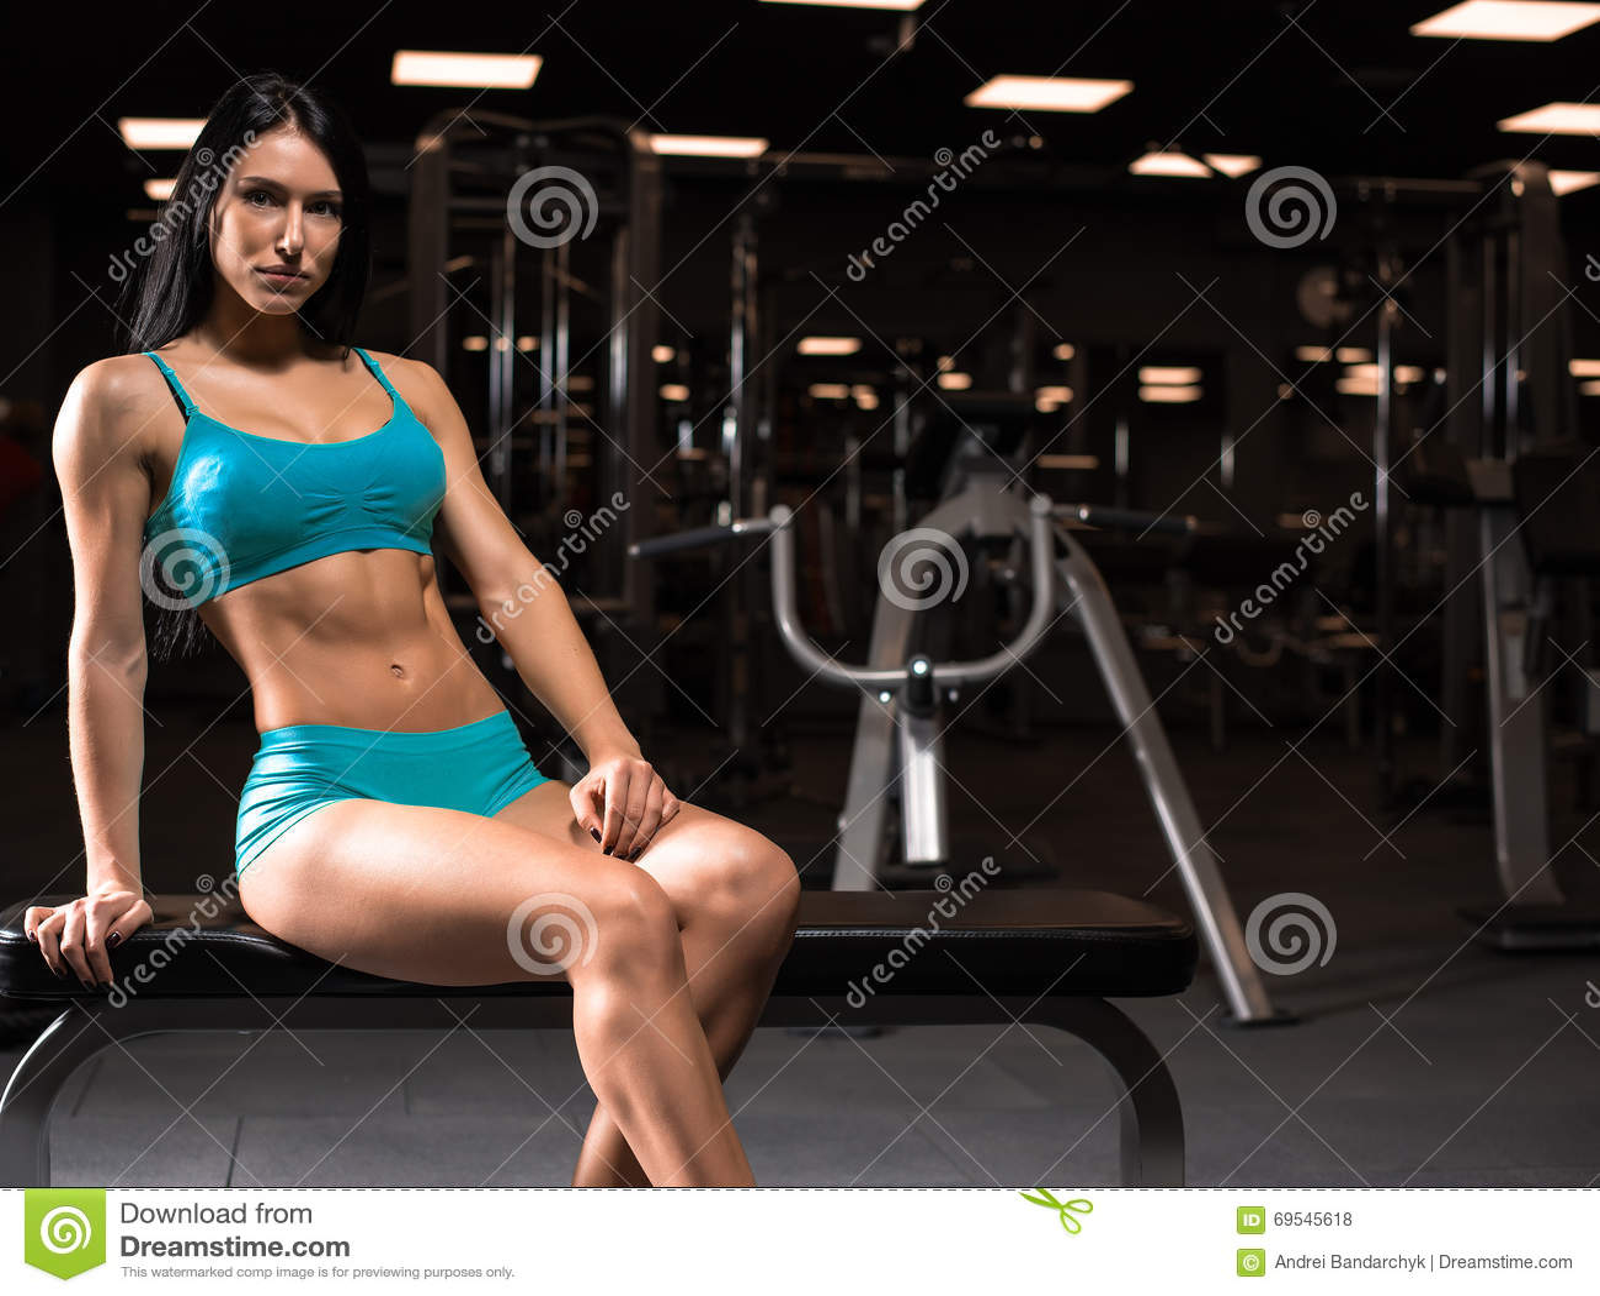 Поход с девушкой в спортзале